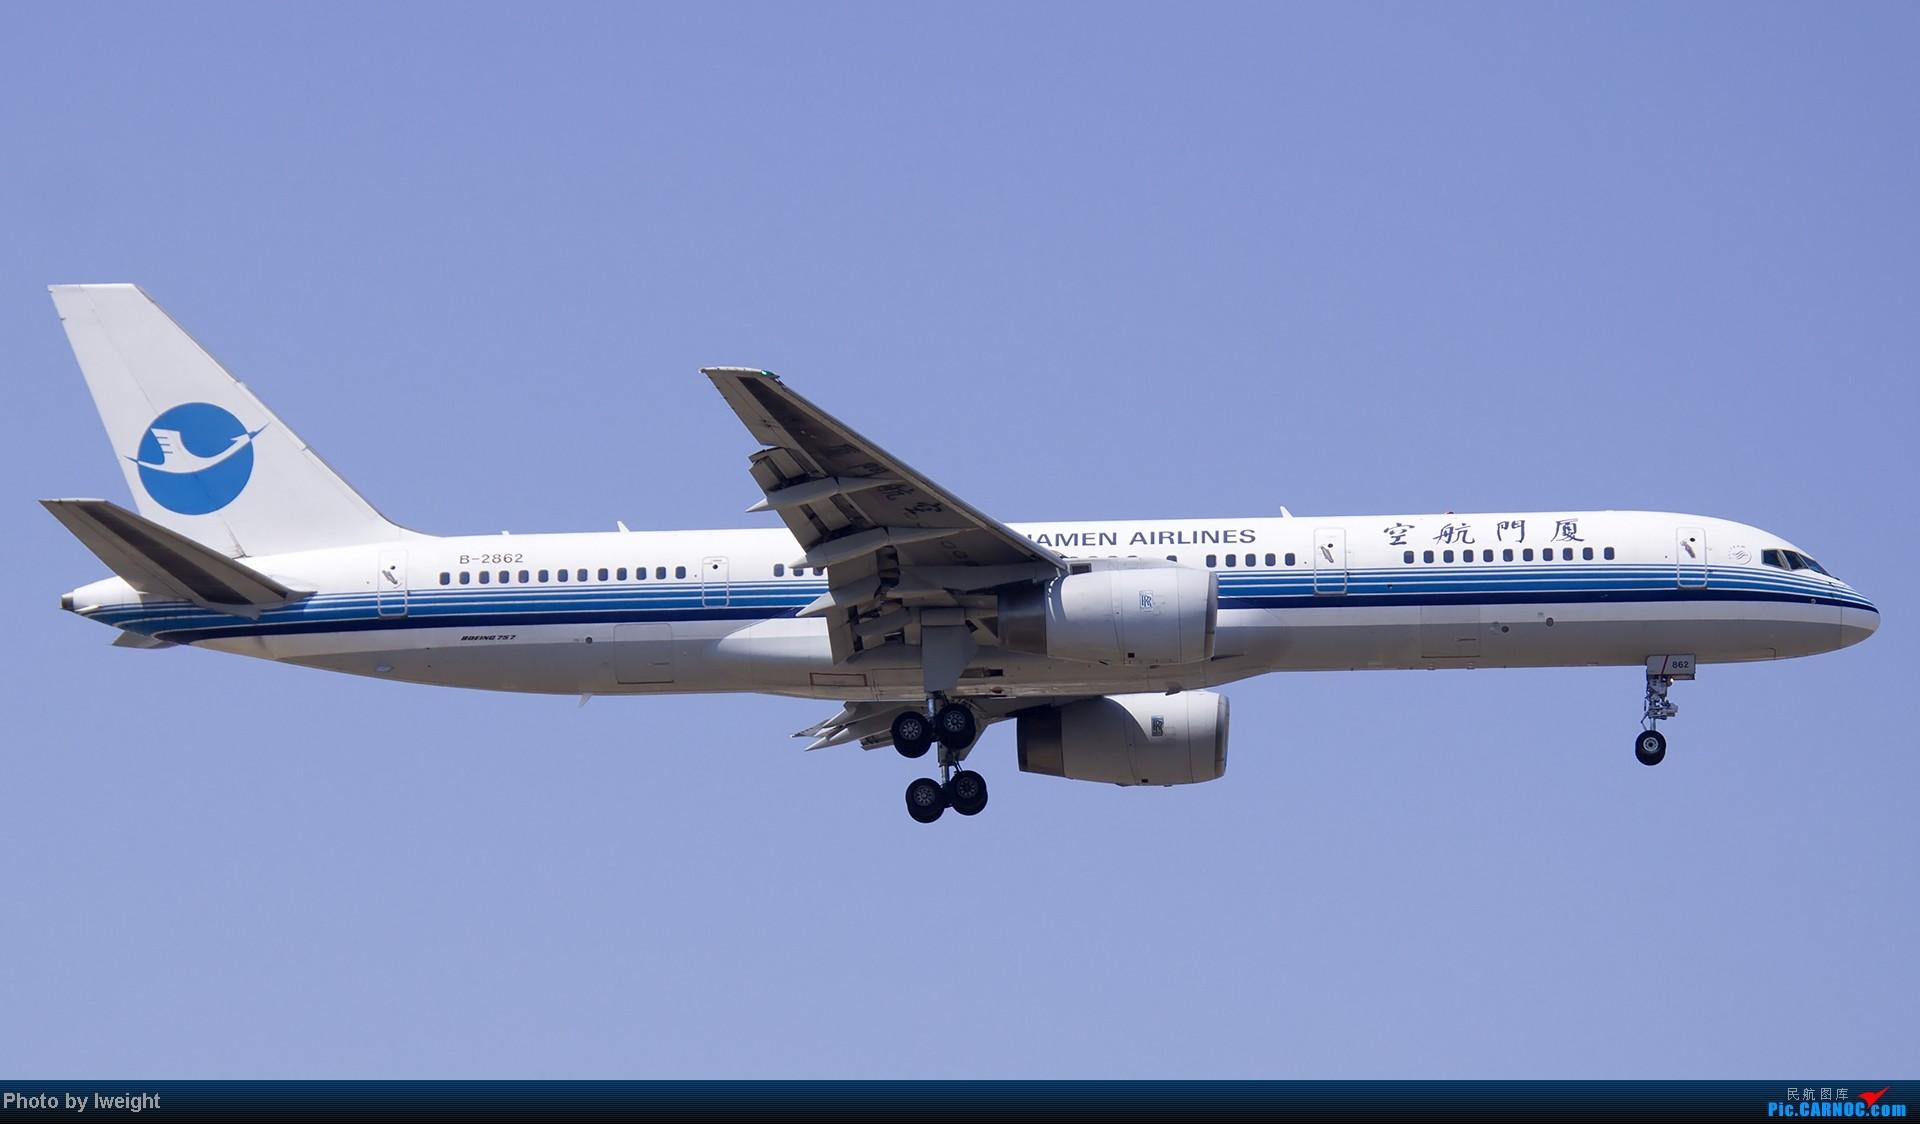 Re:[原创]北京难得的好天气,收获多种机型和彩绘,遗憾的是再次错过卡航巴塞罗那彩绘 BOEING 757-200 B-2862 中国北京首都机场